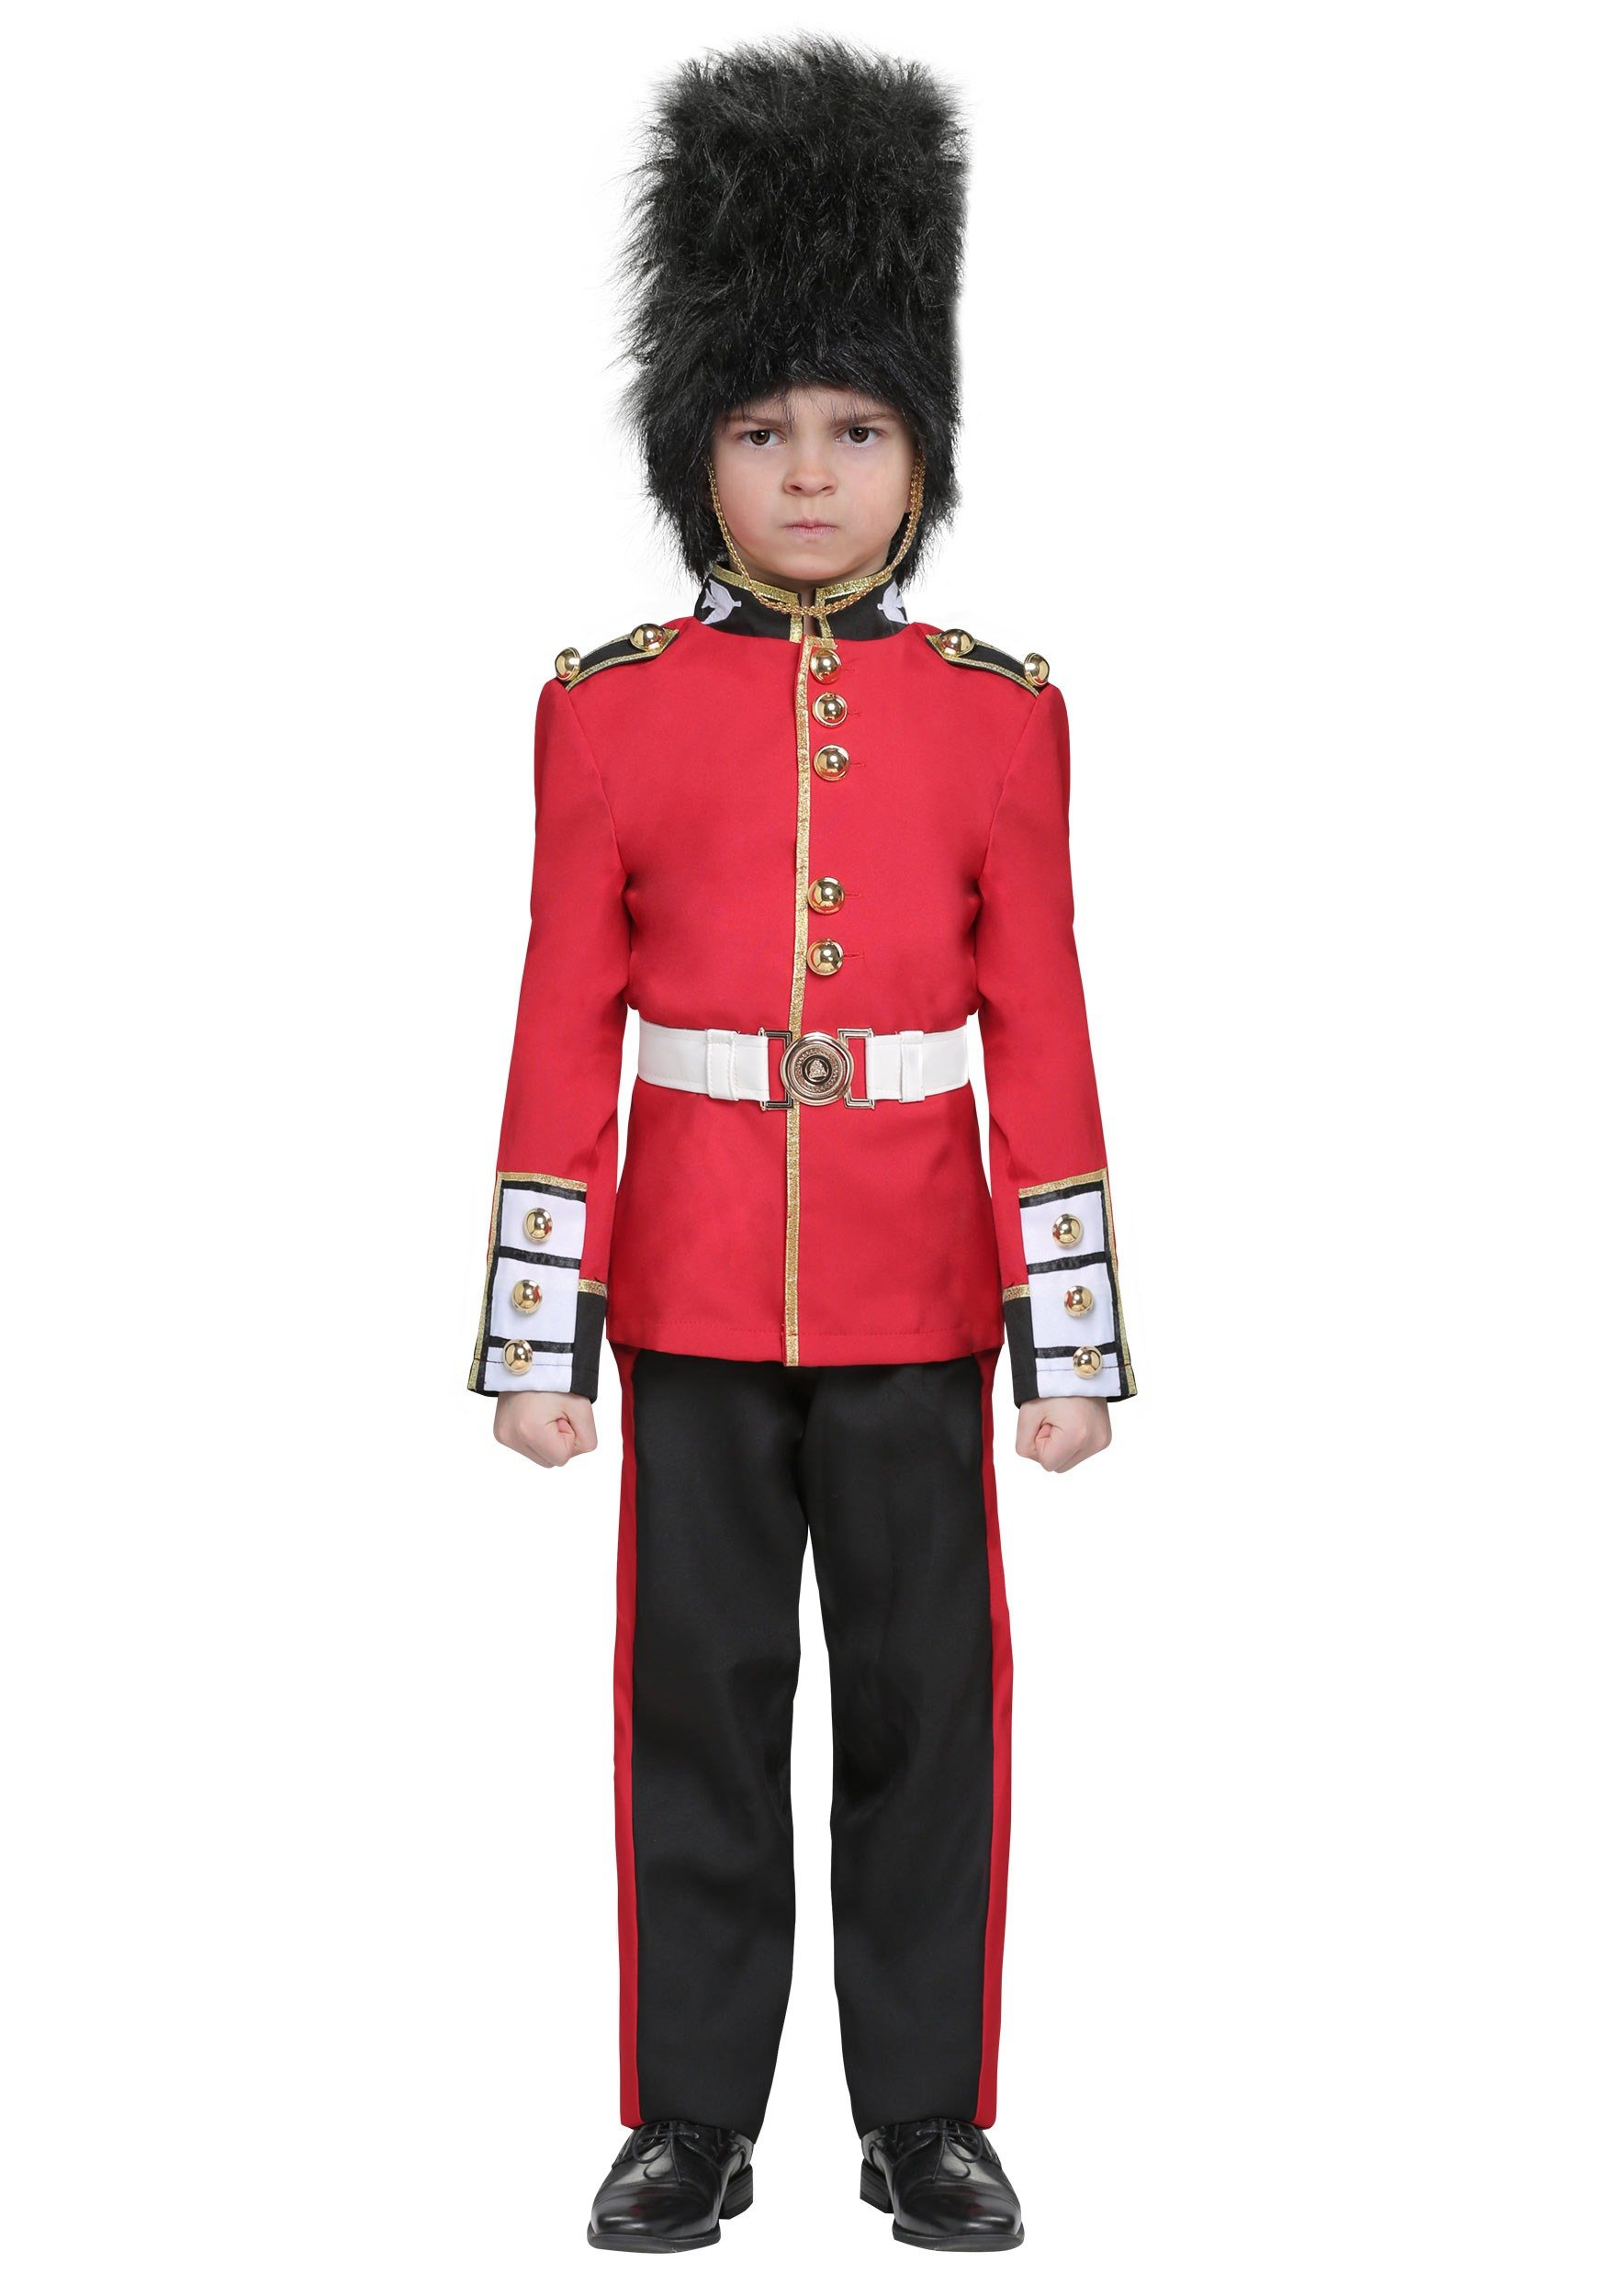 Boys Royal Guard Costume - S